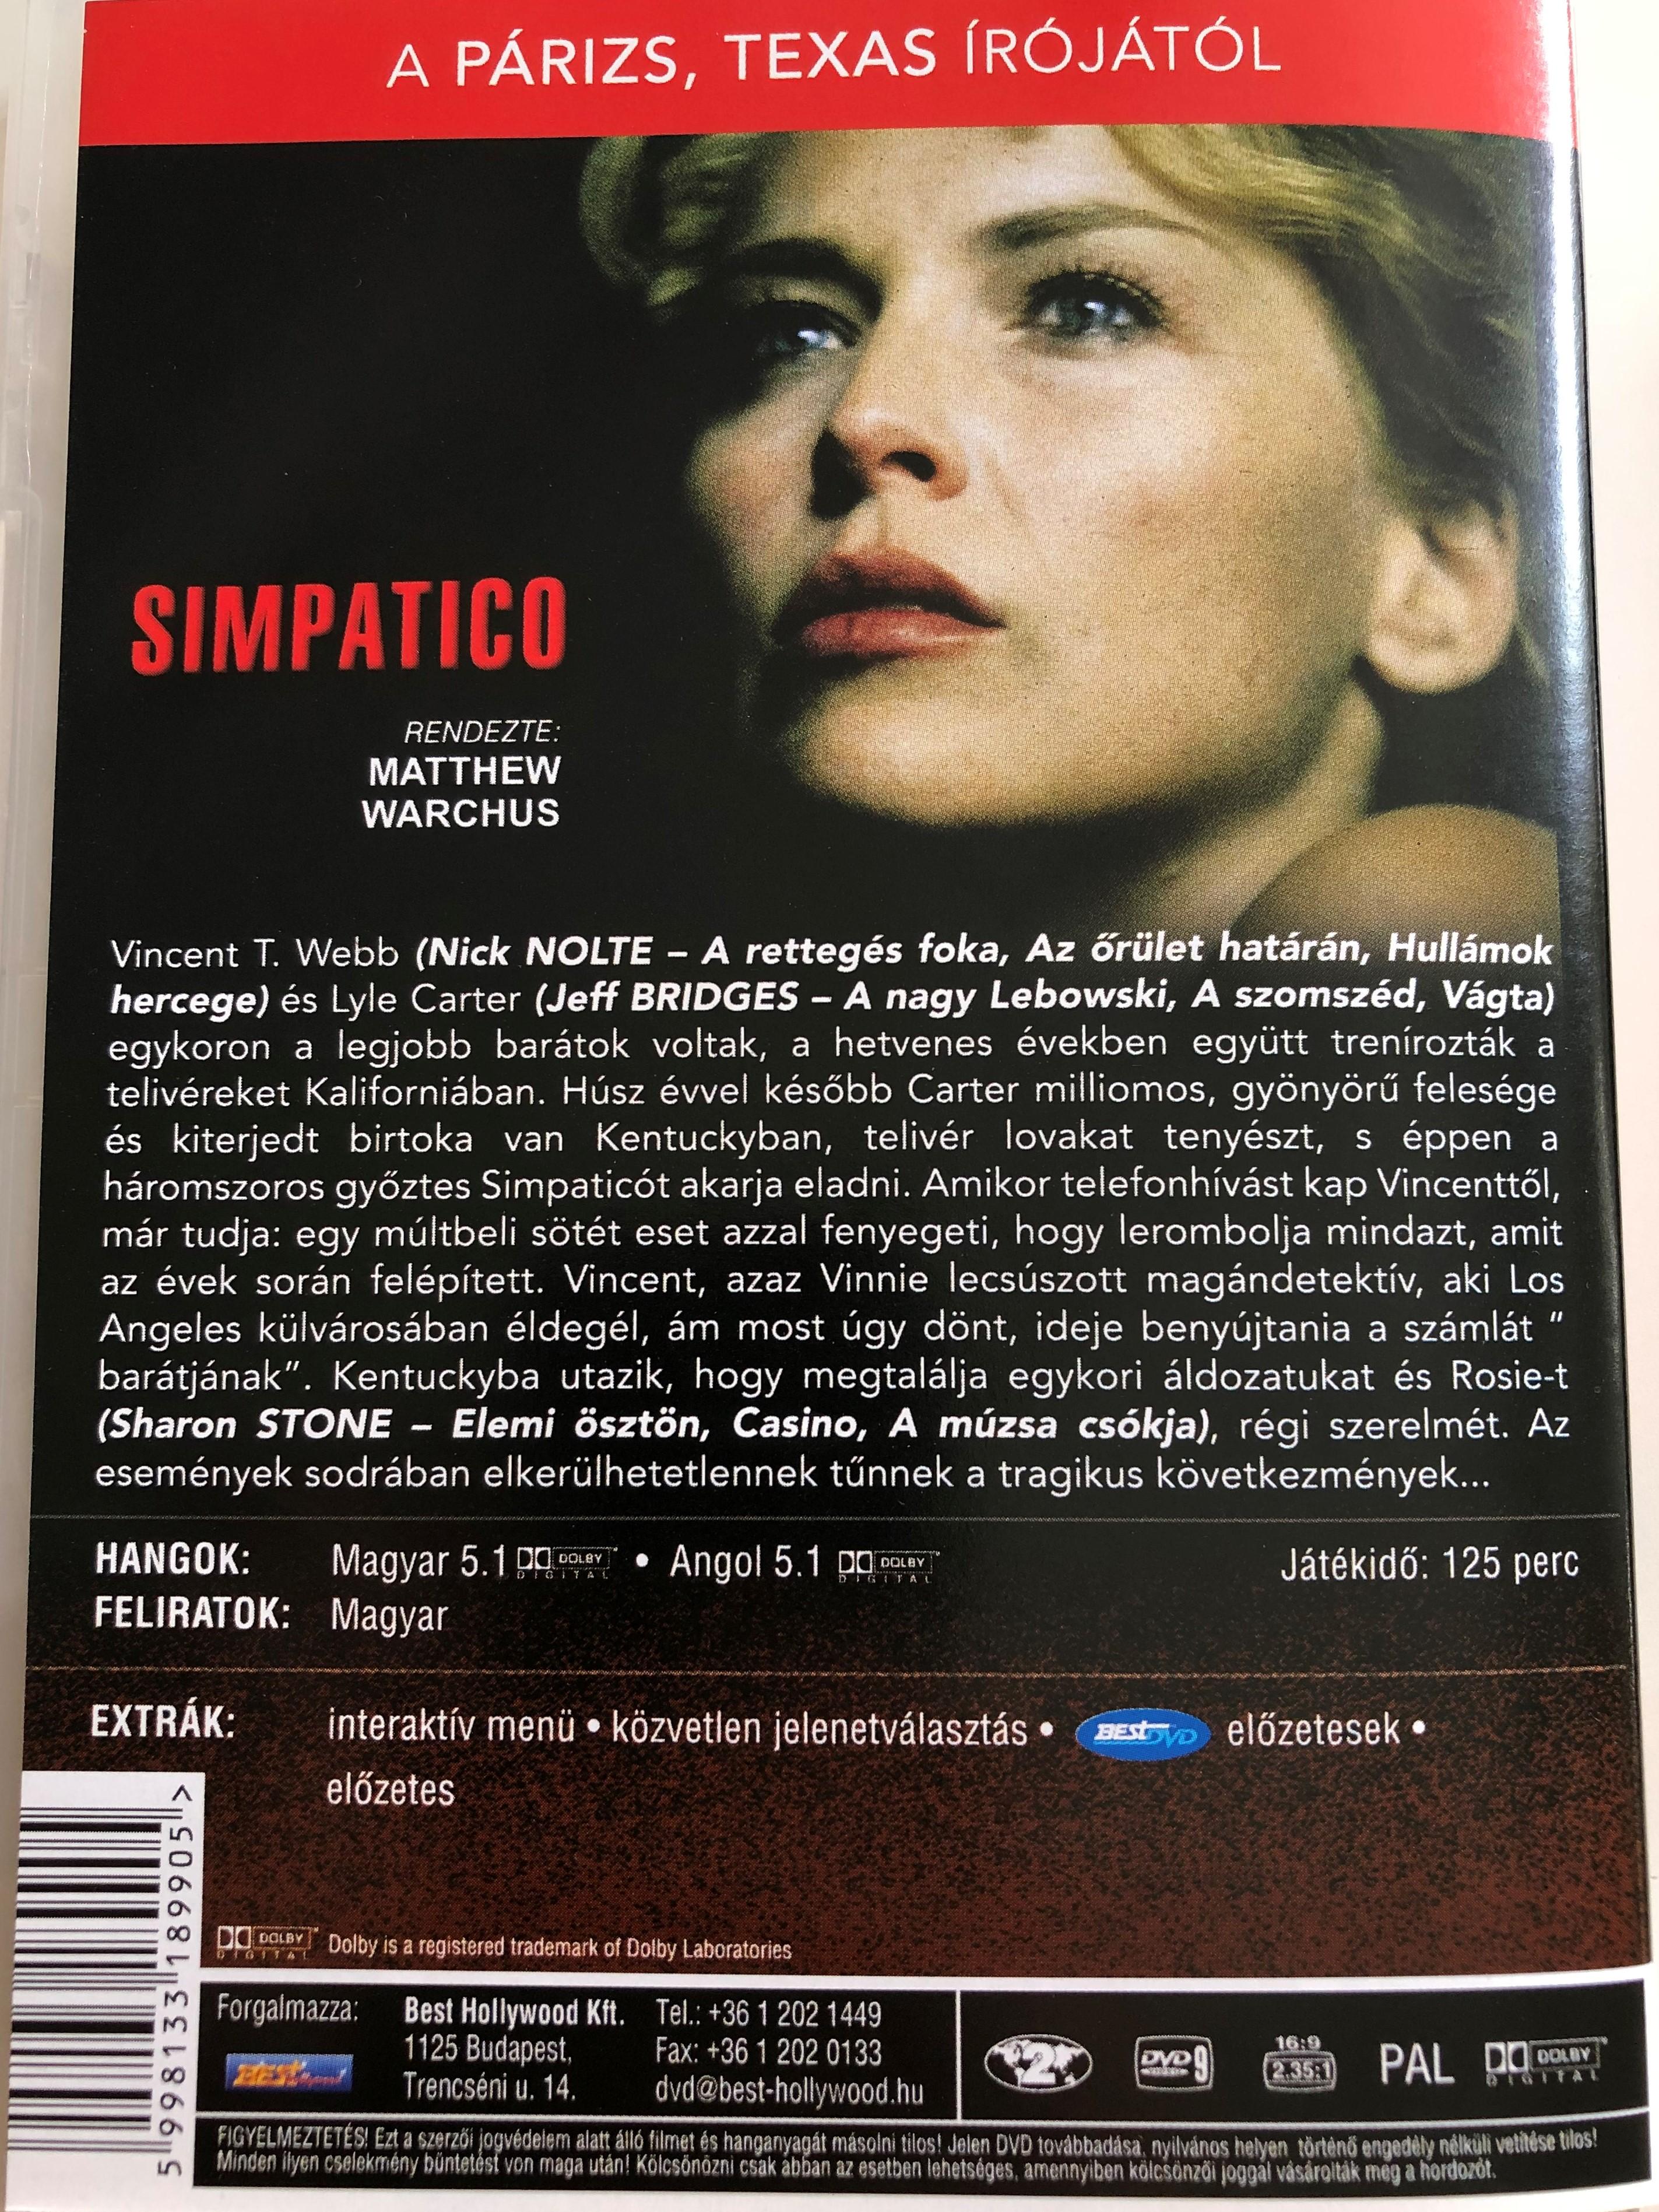 simpatico-dvd-1999-directed-by-matthew-warchus-starring-nick-nolte-jeff-bridges-sharon-stone-catherine-keener-albert-finney-liam-waite-2-.jpg